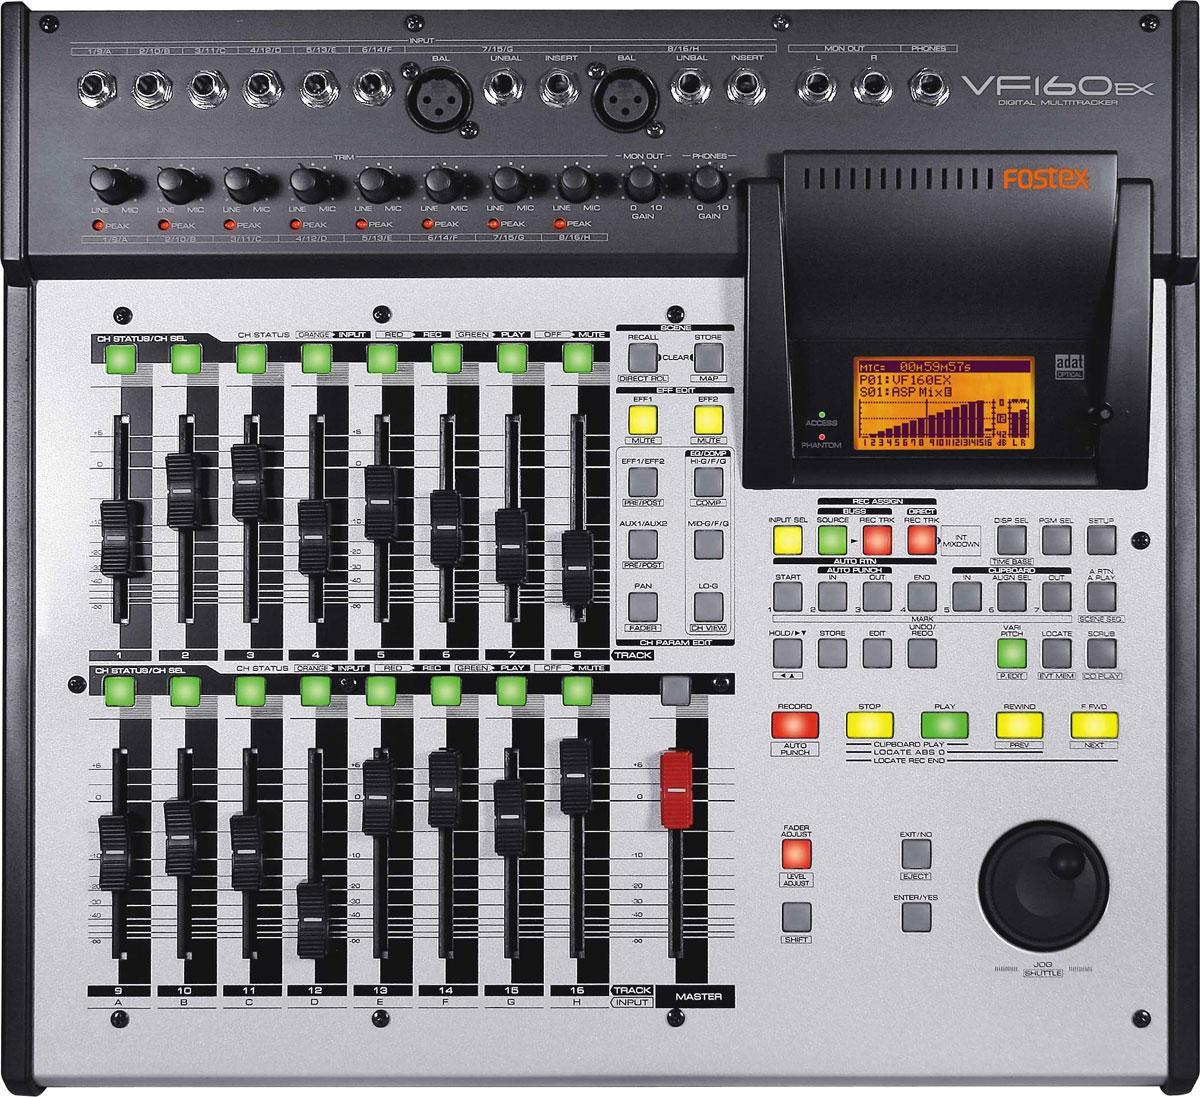 fostex vf160ex image 307871 audiofanzine rh en audiofanzine com Fostex Multitracker 160 Fostex Digital Recorder